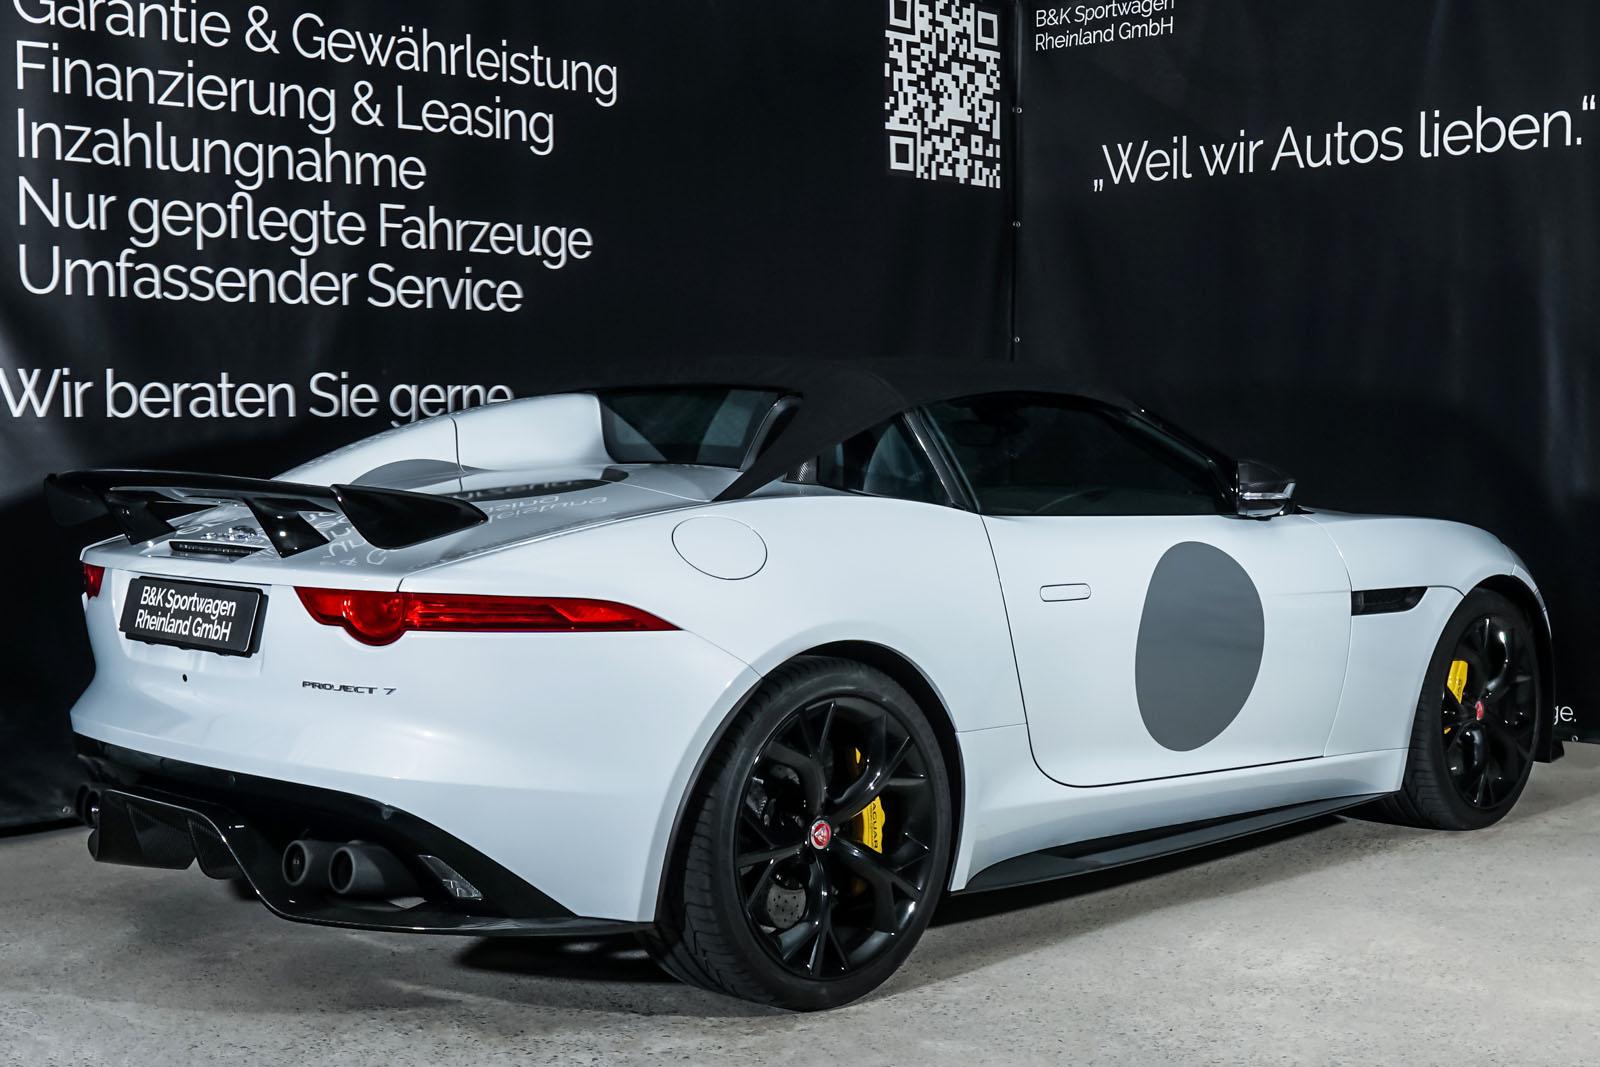 Jaguar_Project7_Weiss_Schwarz_JAG-0829_31_w